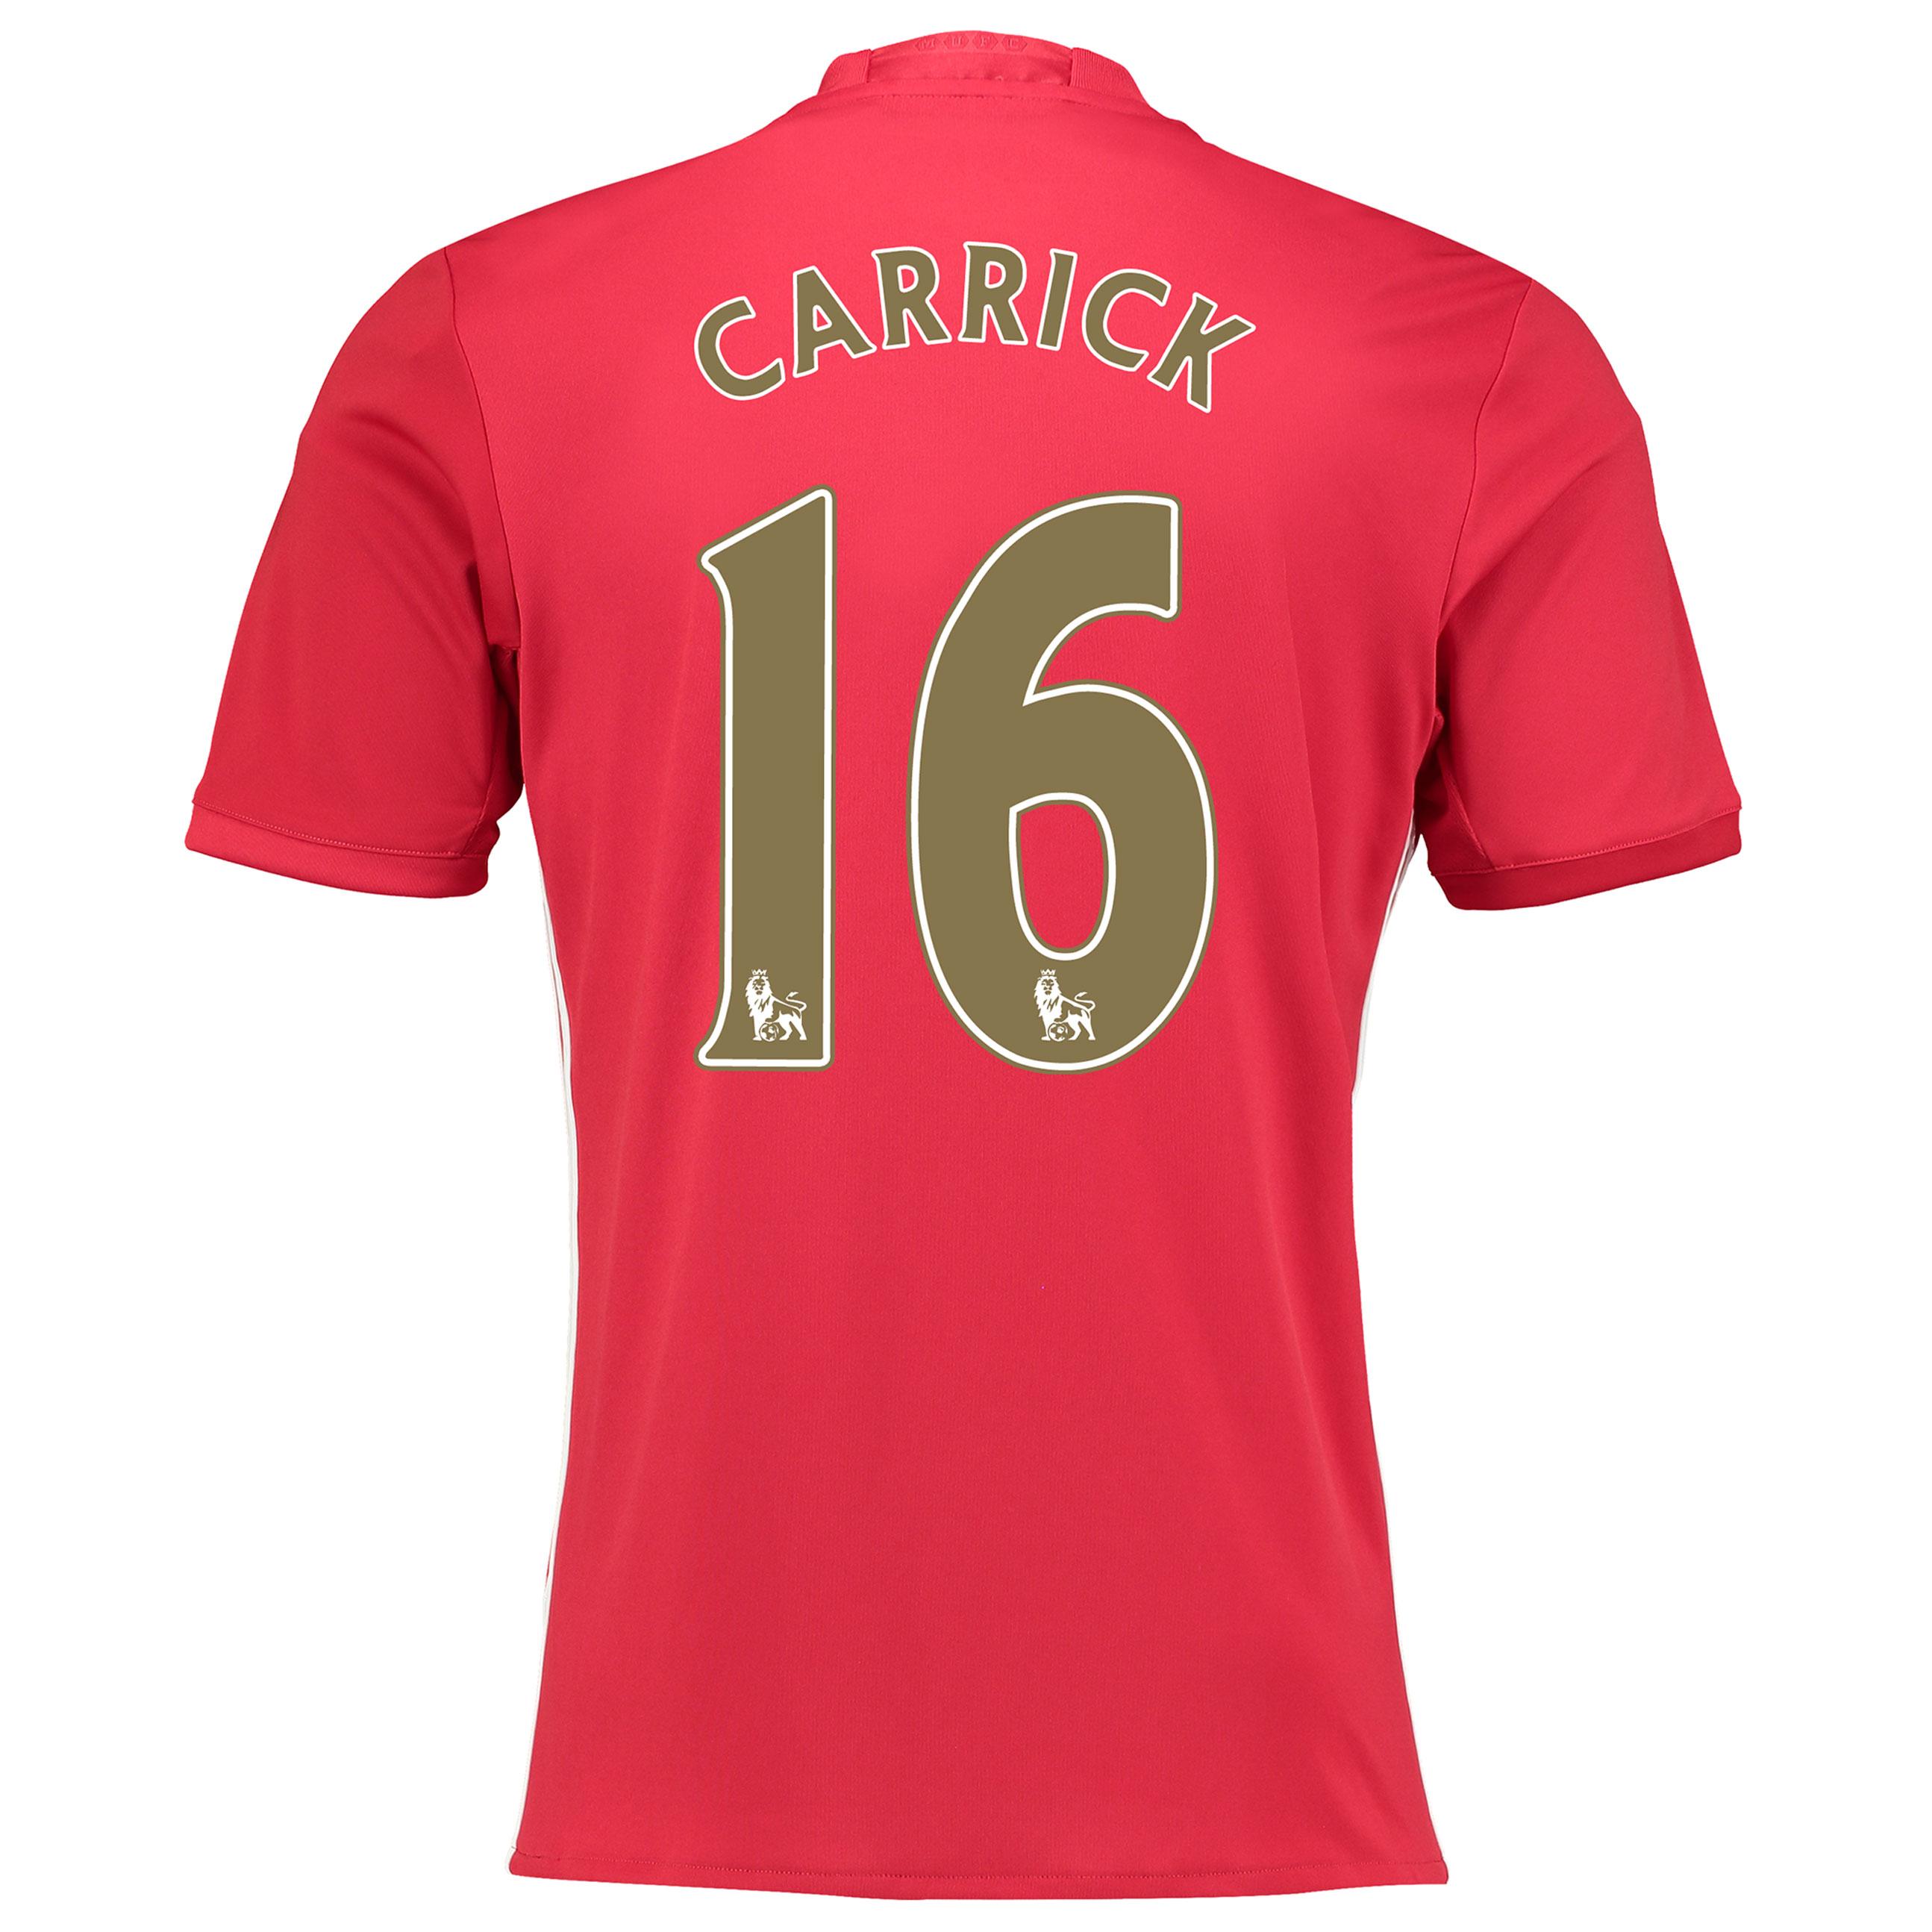 Manchester United Carrick Testimonial Home Shirt 2016-17